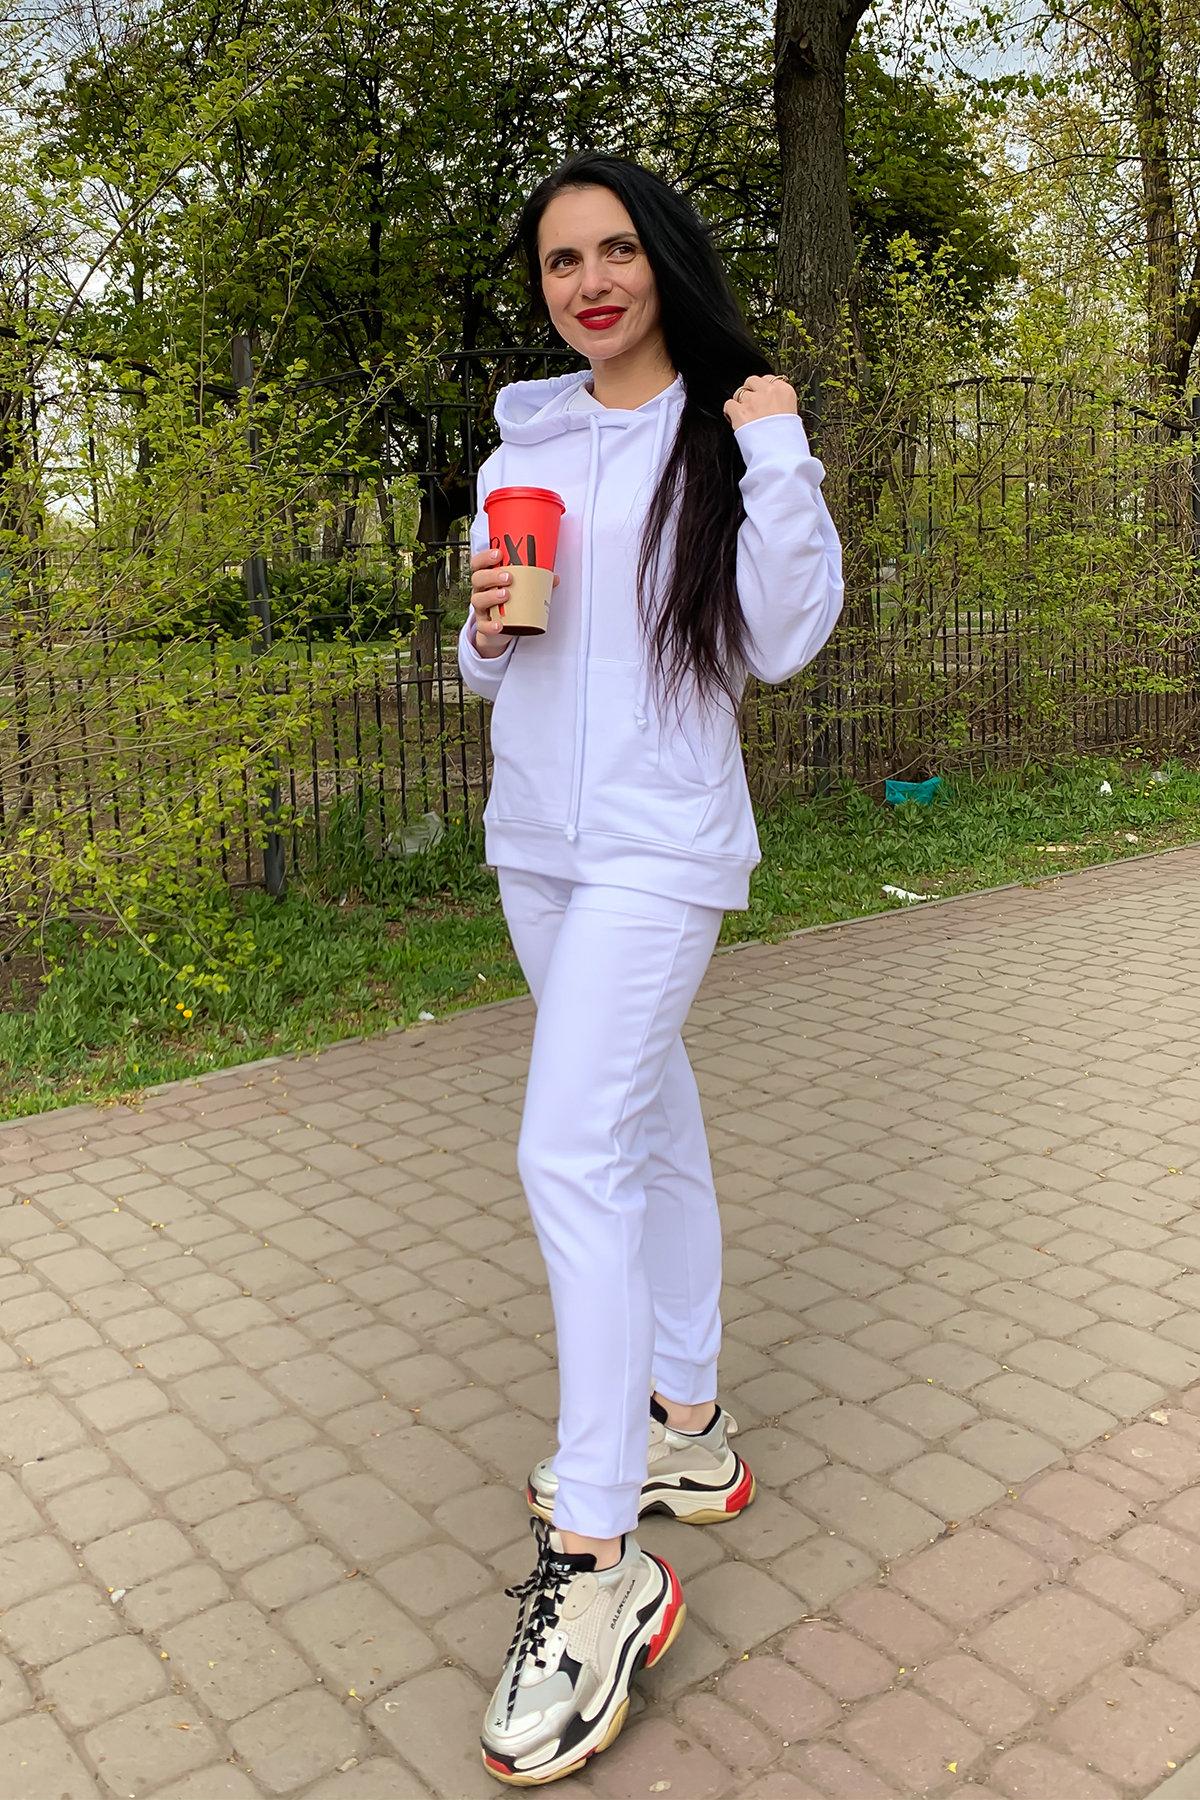 Костюм Викки 9177 АРТ. 45511 Цвет: Белый - фото 2, интернет магазин tm-modus.ru